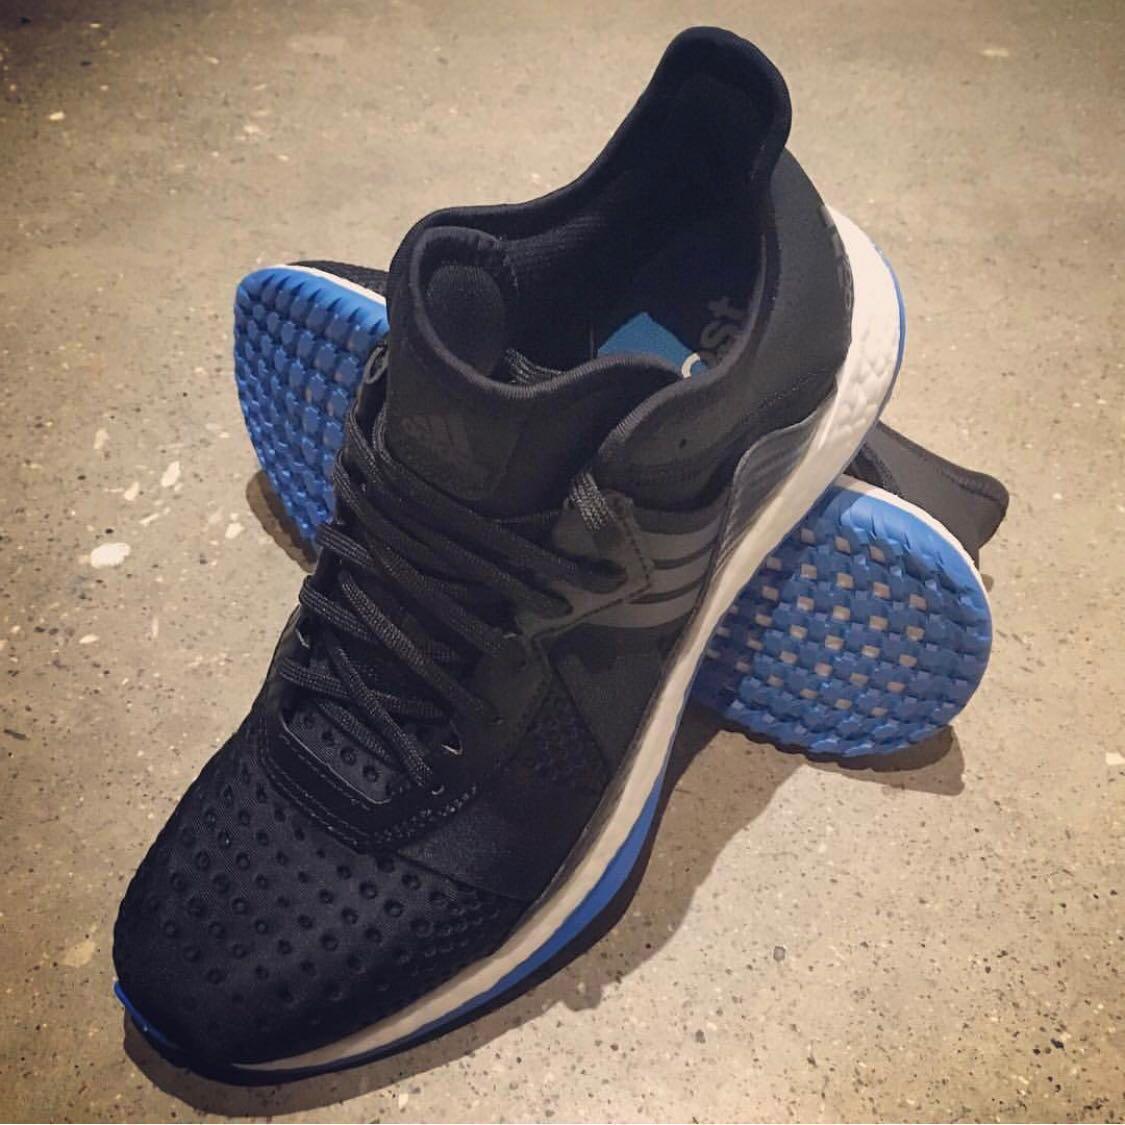 Adidas PureBOOST ZG Trainer AQ5037, Men's Fashion, Footwear ...